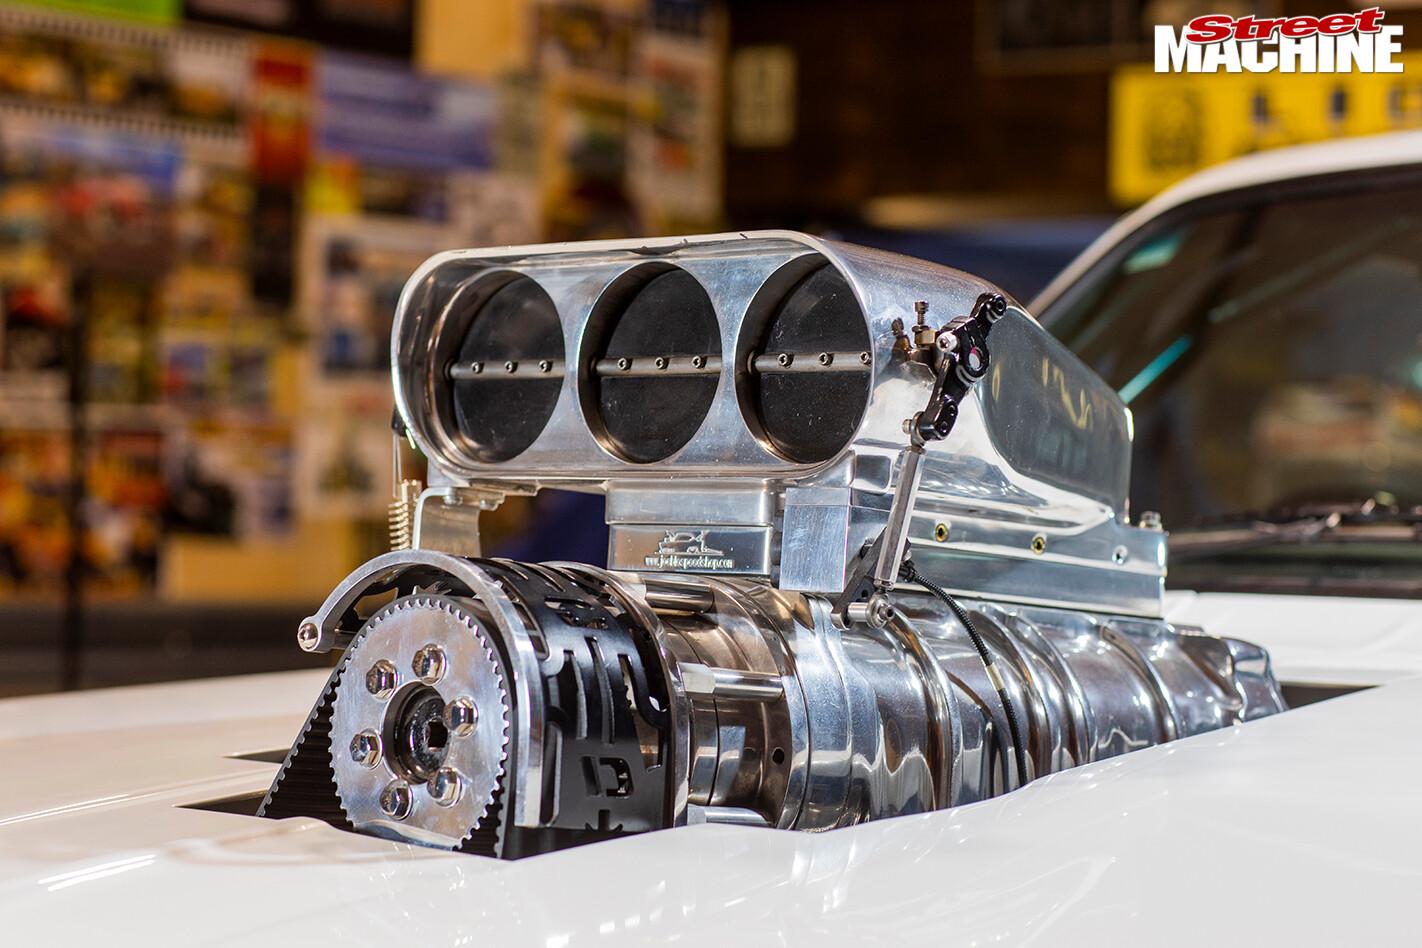 Street Machine Features Holden Ht Monaro Bonnet